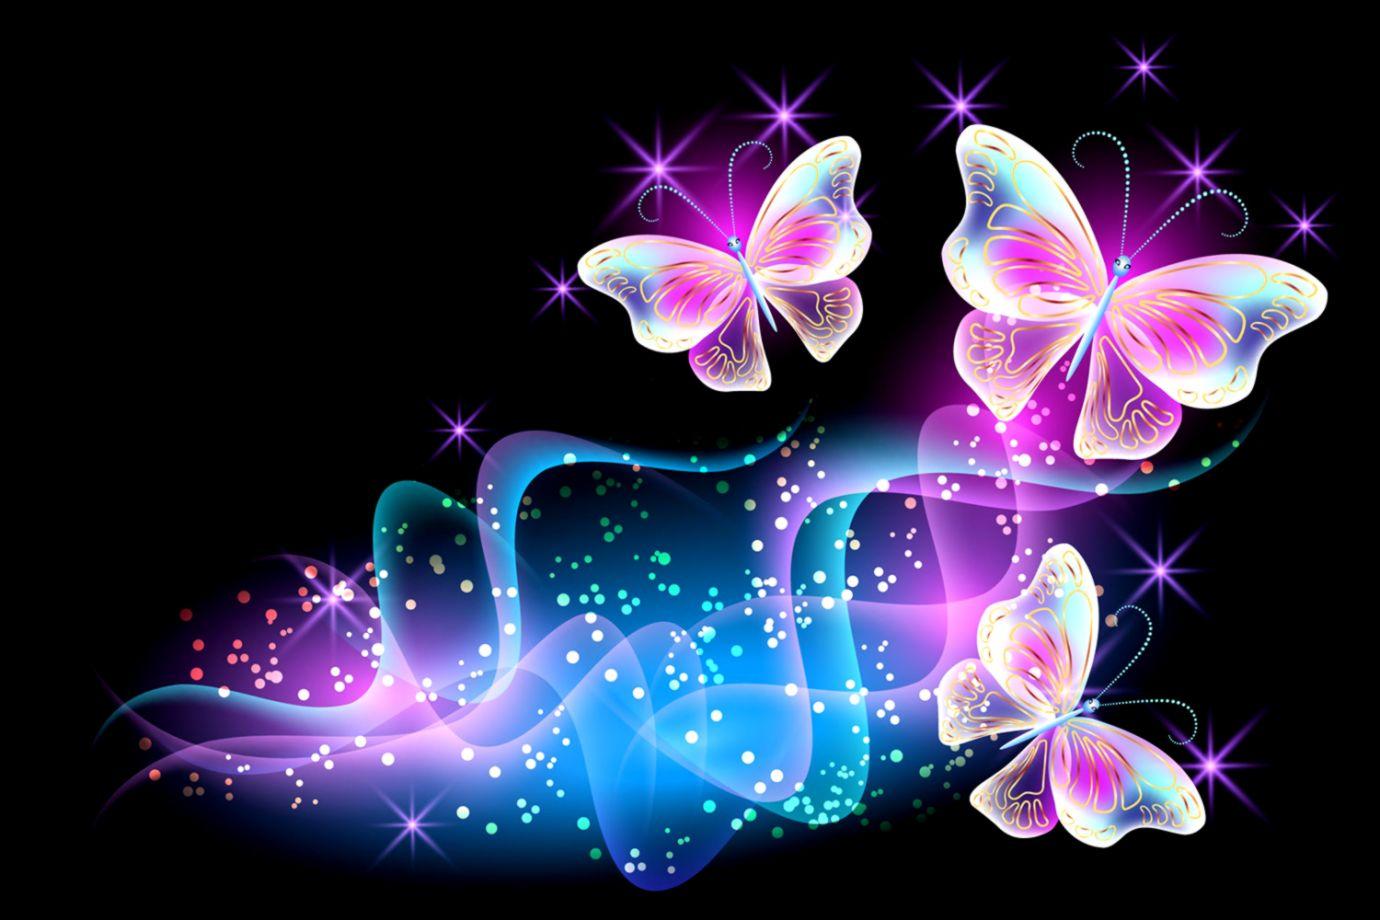 Nice Decoration Pink Butterfly Wallpaper Butterflies - Colorful Neon Butterfly 3d , HD Wallpaper & Backgrounds